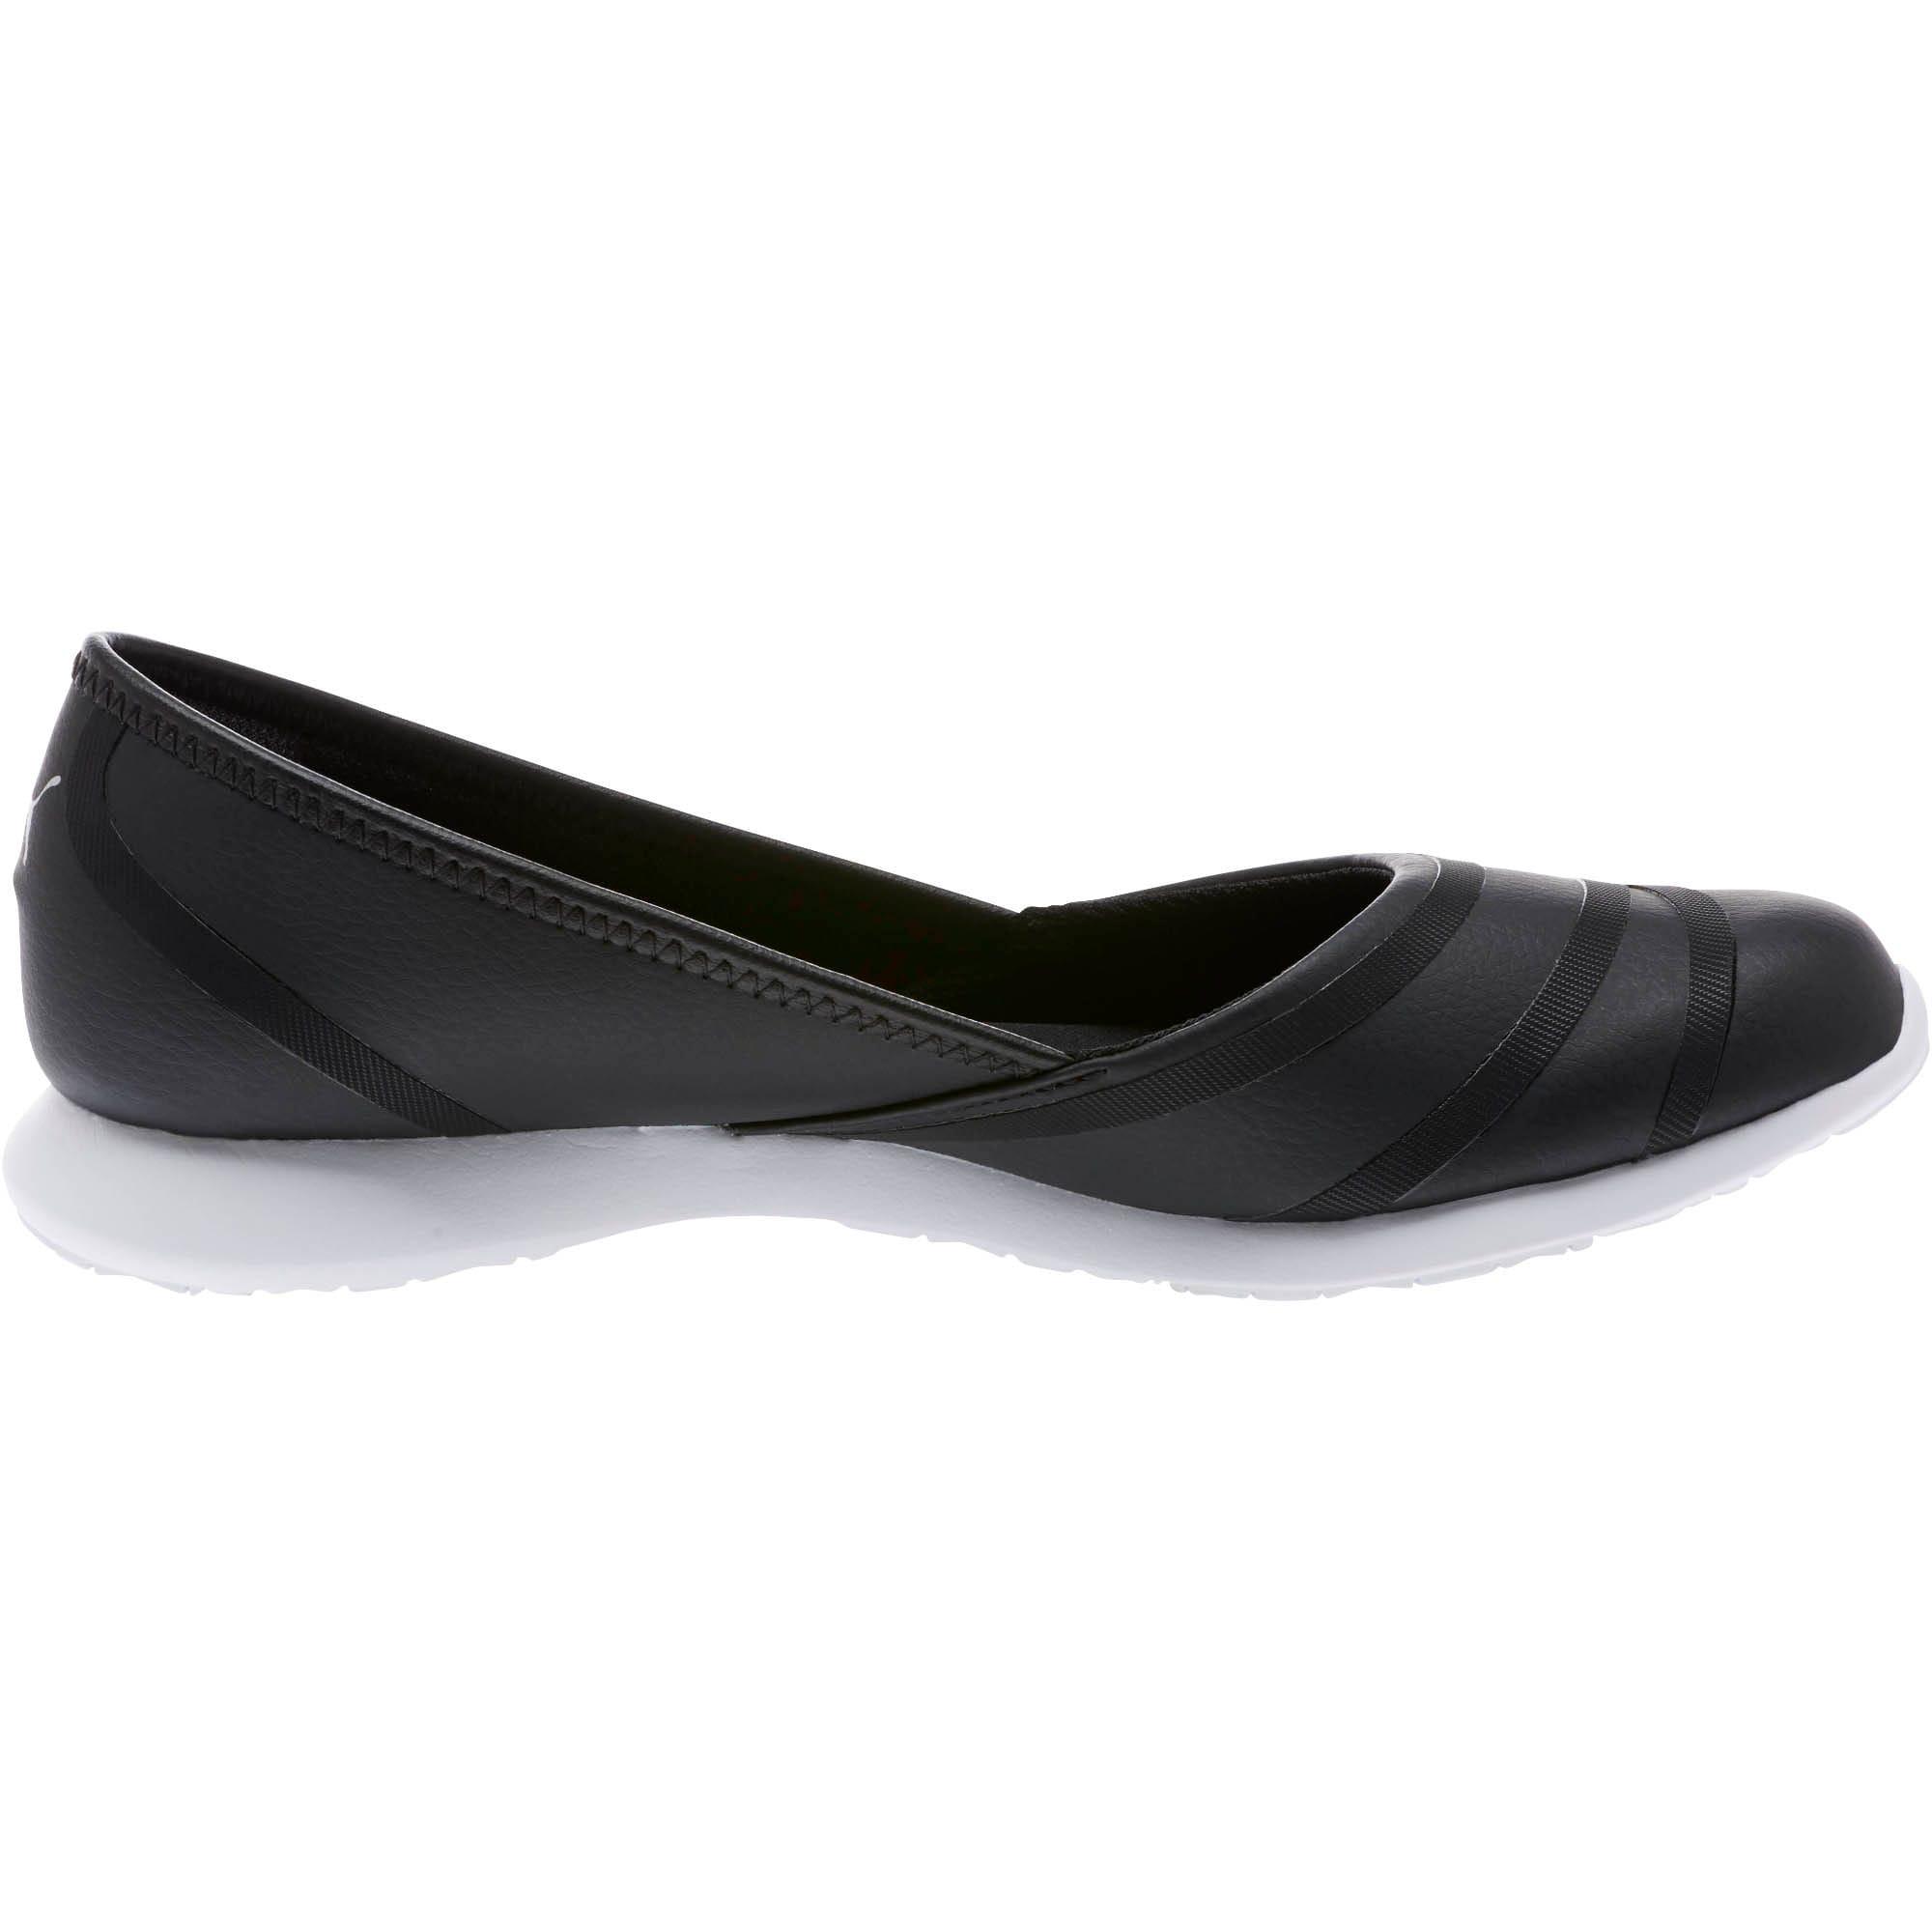 Thumbnail 3 of PUMA Vega Ballet Women's SL Shoes, Puma Black-Puma Black, medium